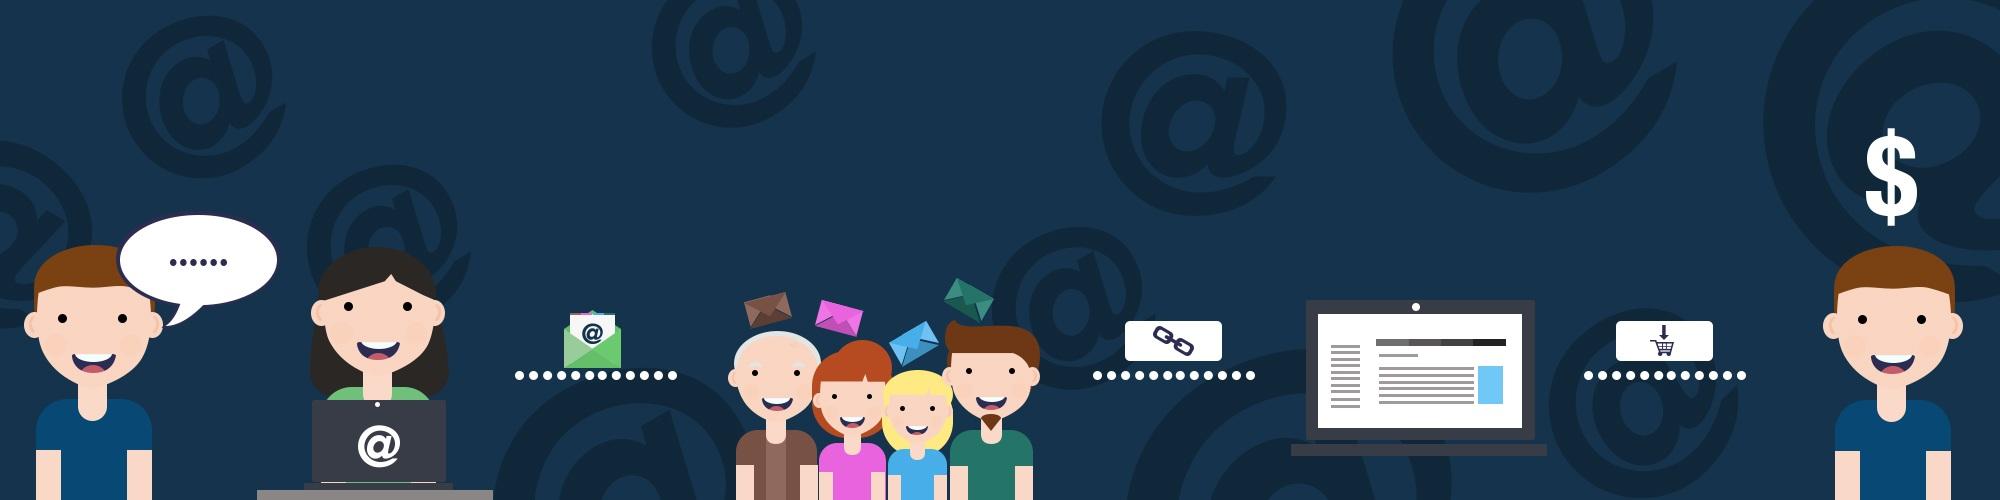 Trina-Waller-email-marketing-2750043